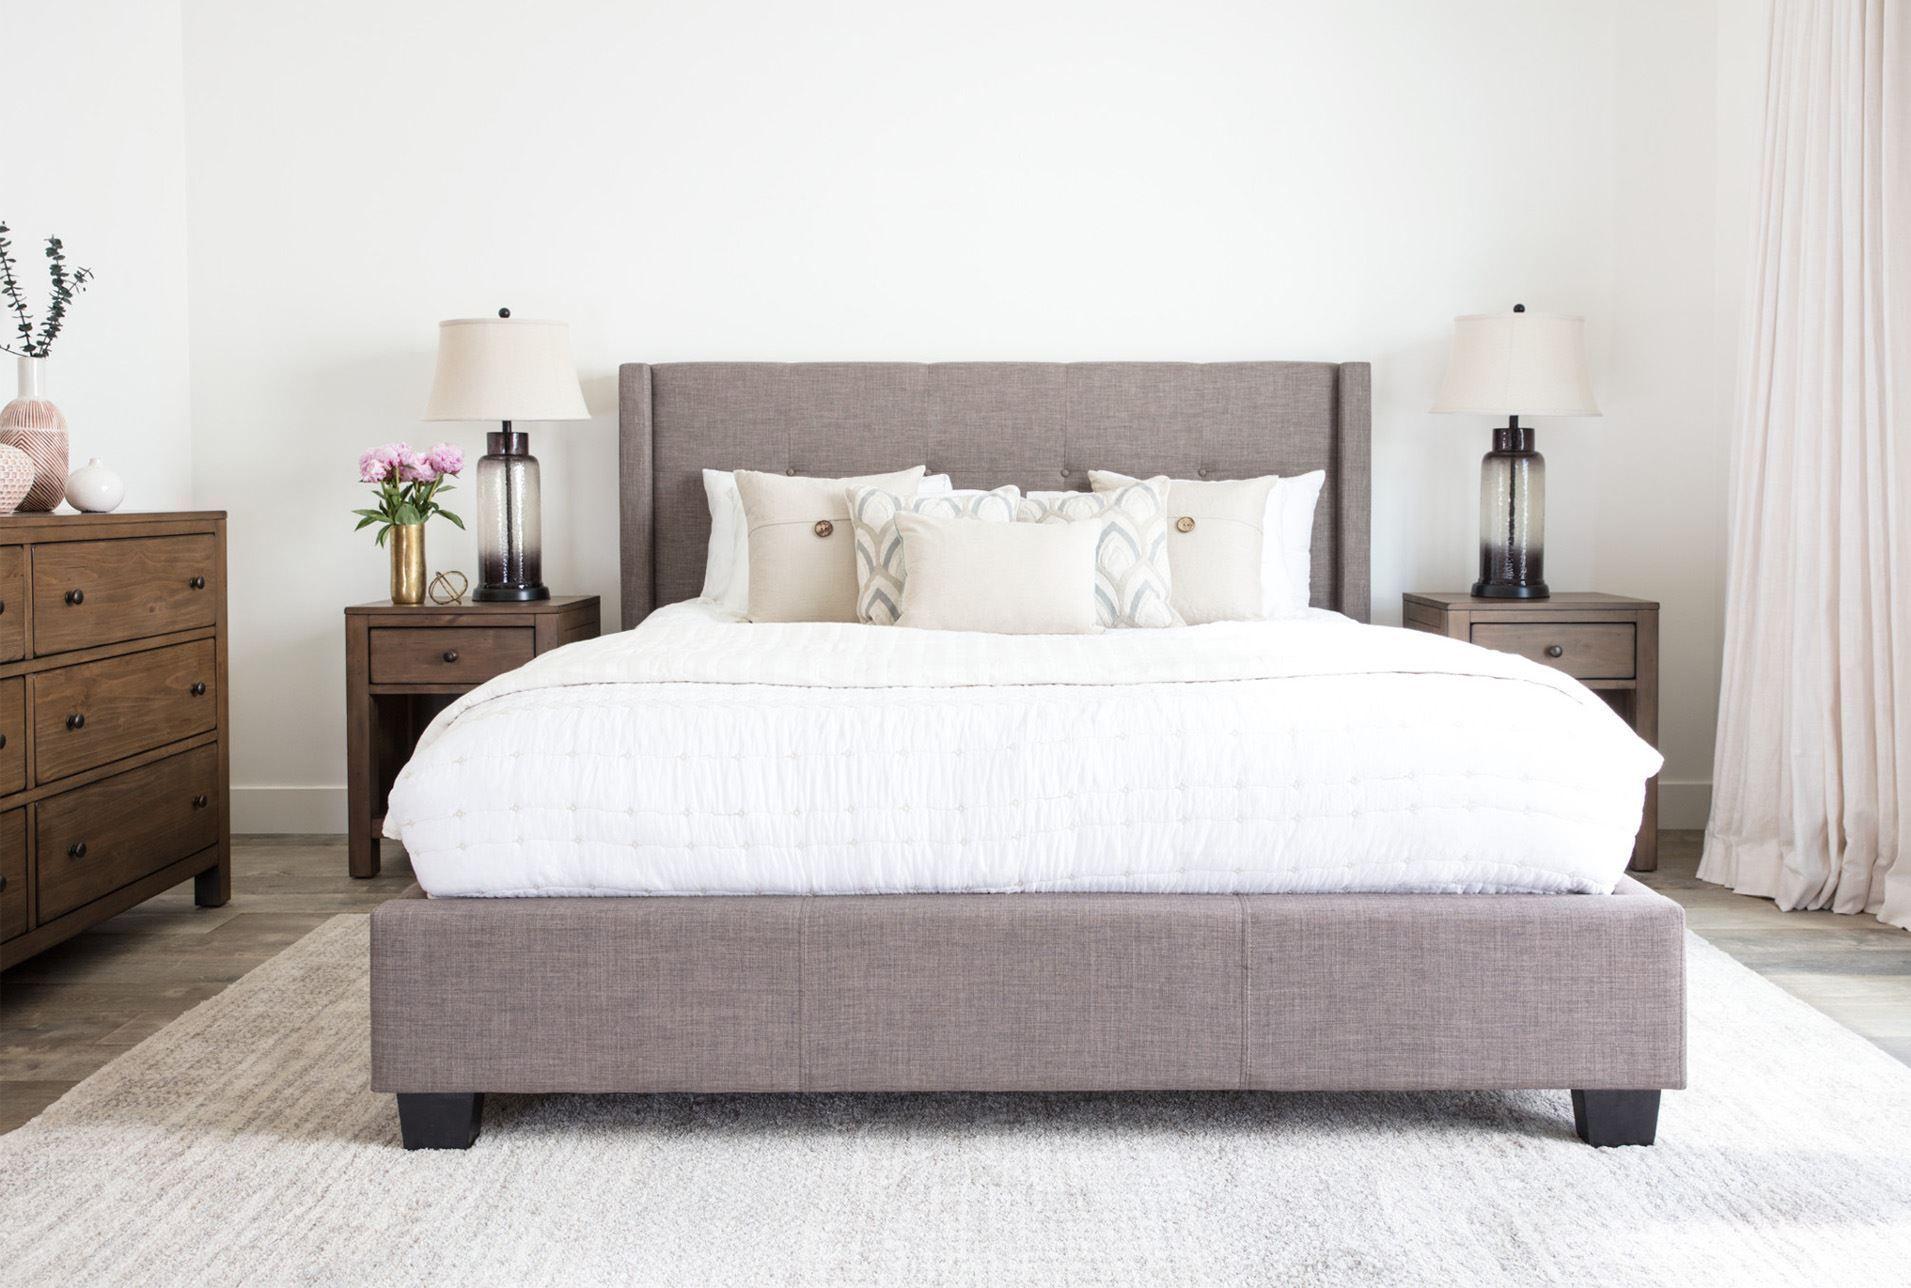 California King Upholstered Platform Bed W/Storage, Damon II, Grey ...